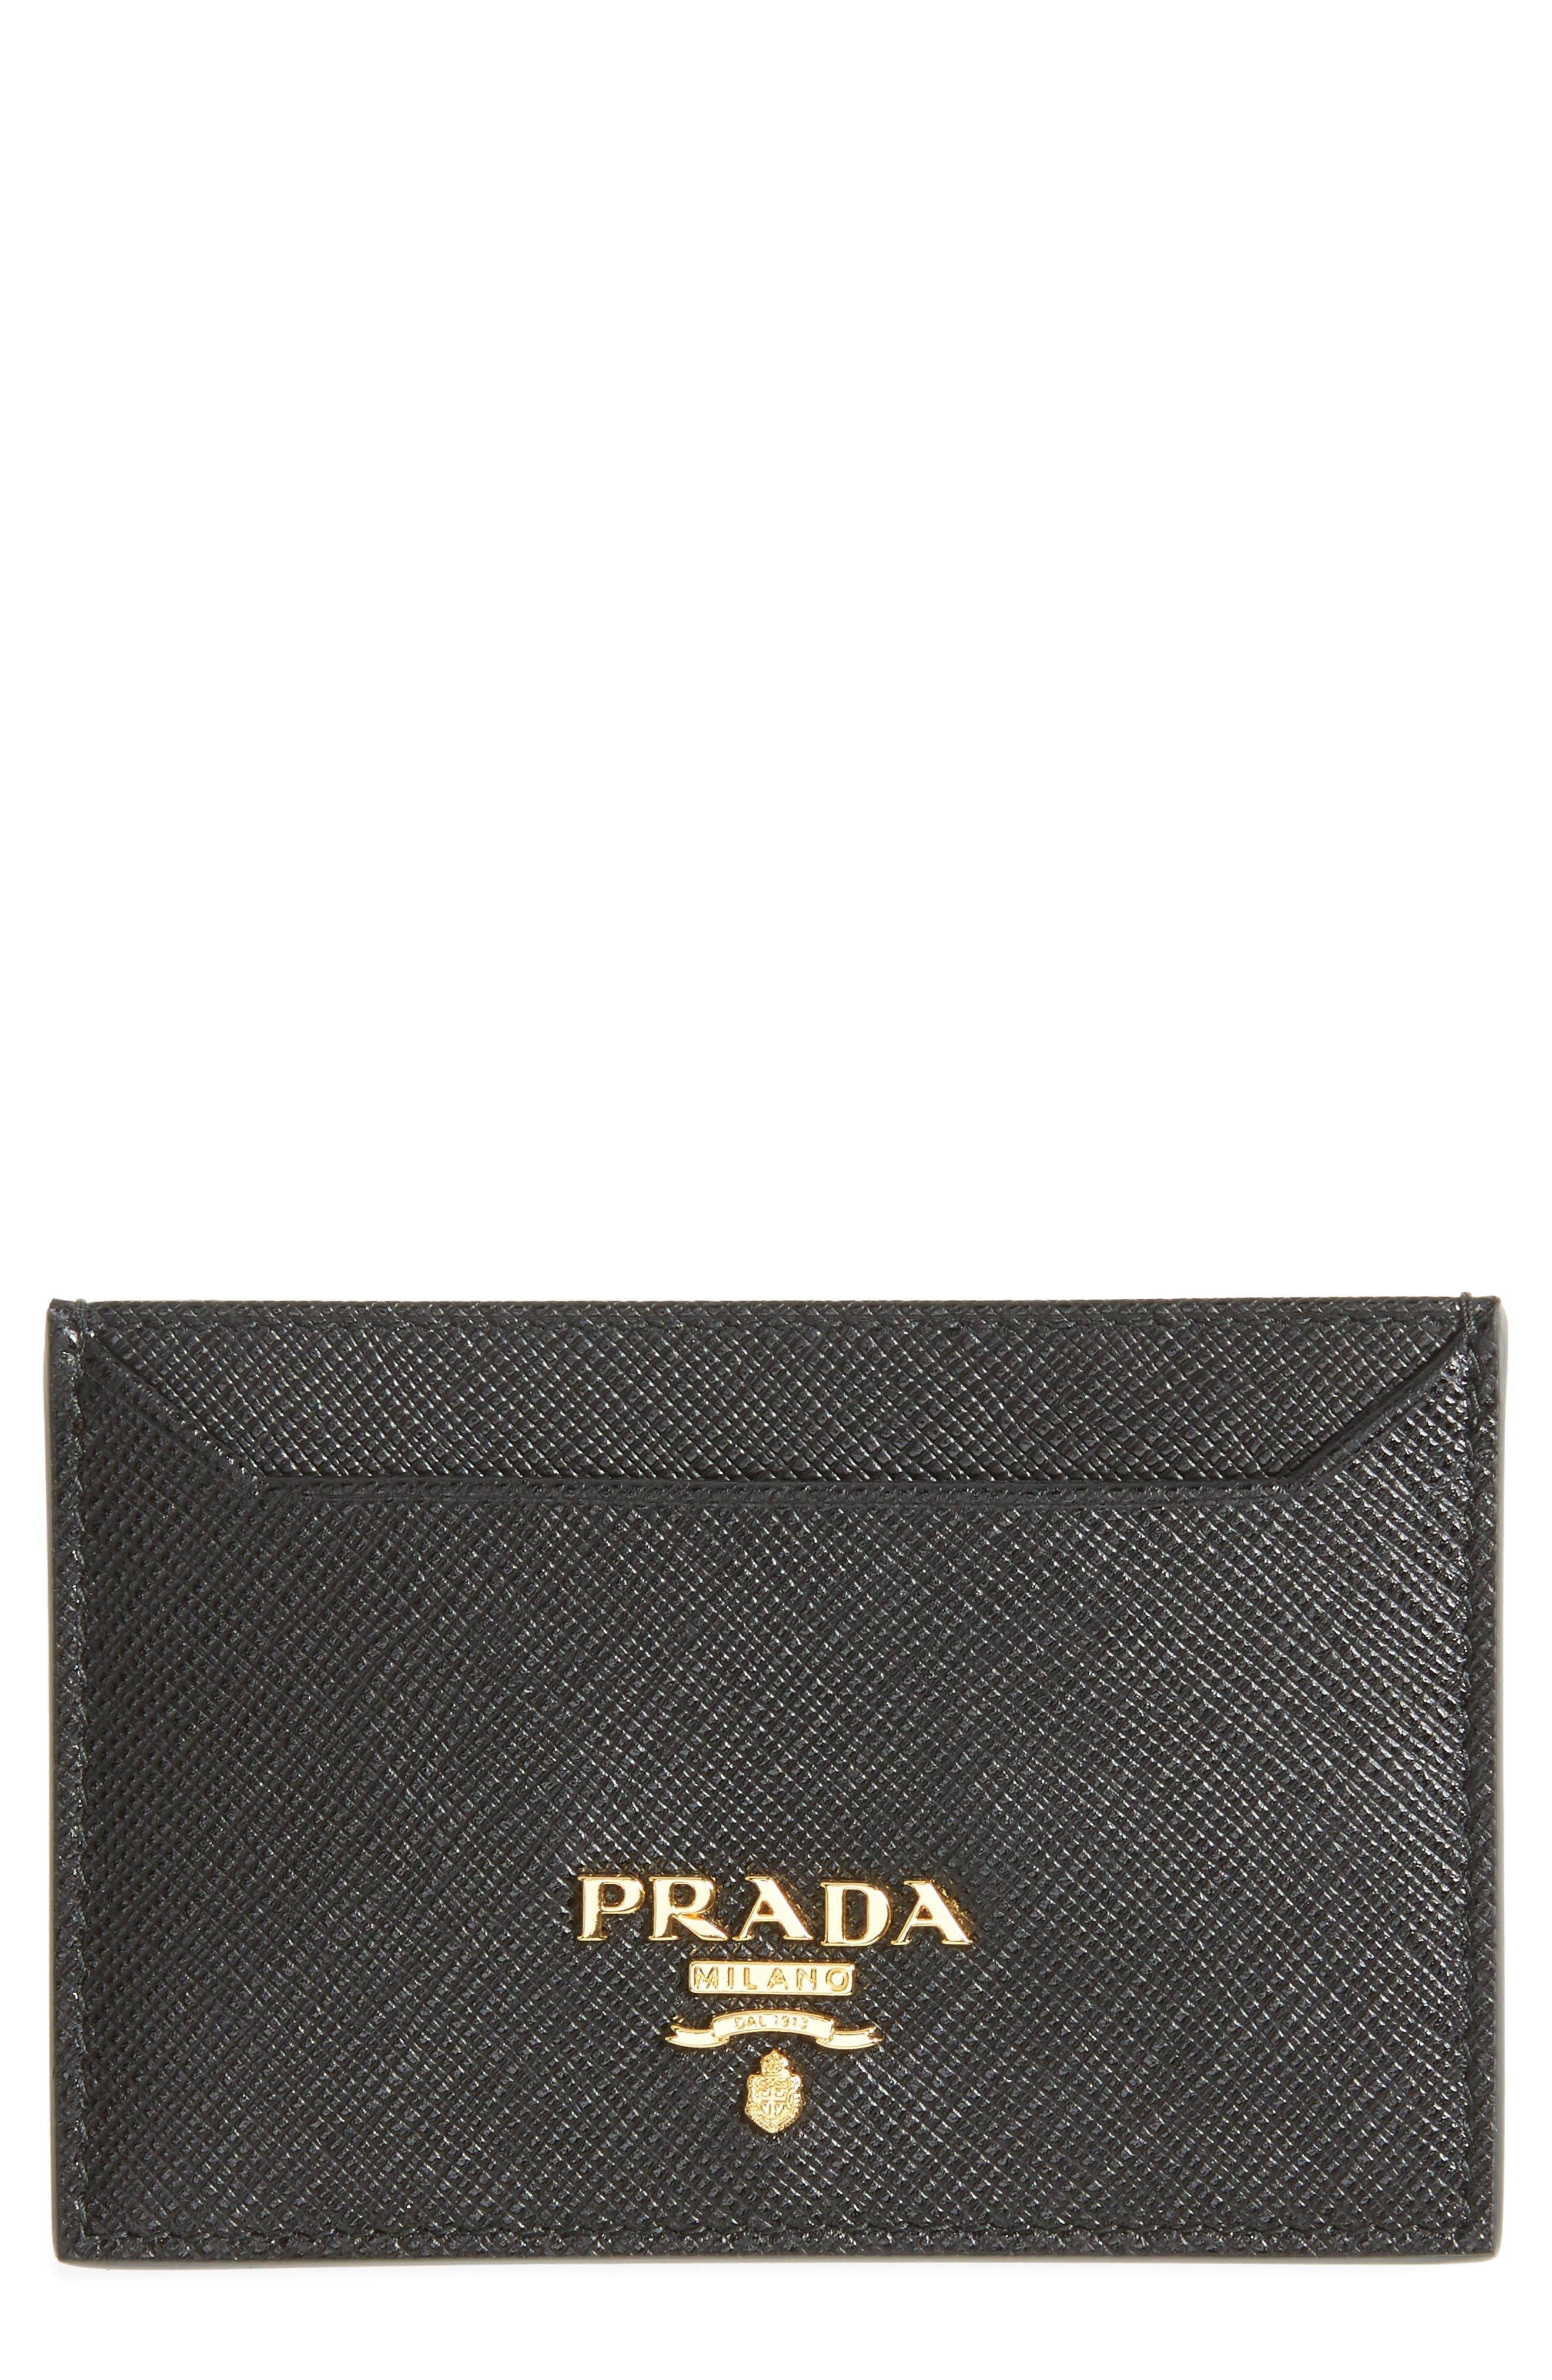 Prada Saffiano Metal Oro Calfskin Leather Card Case